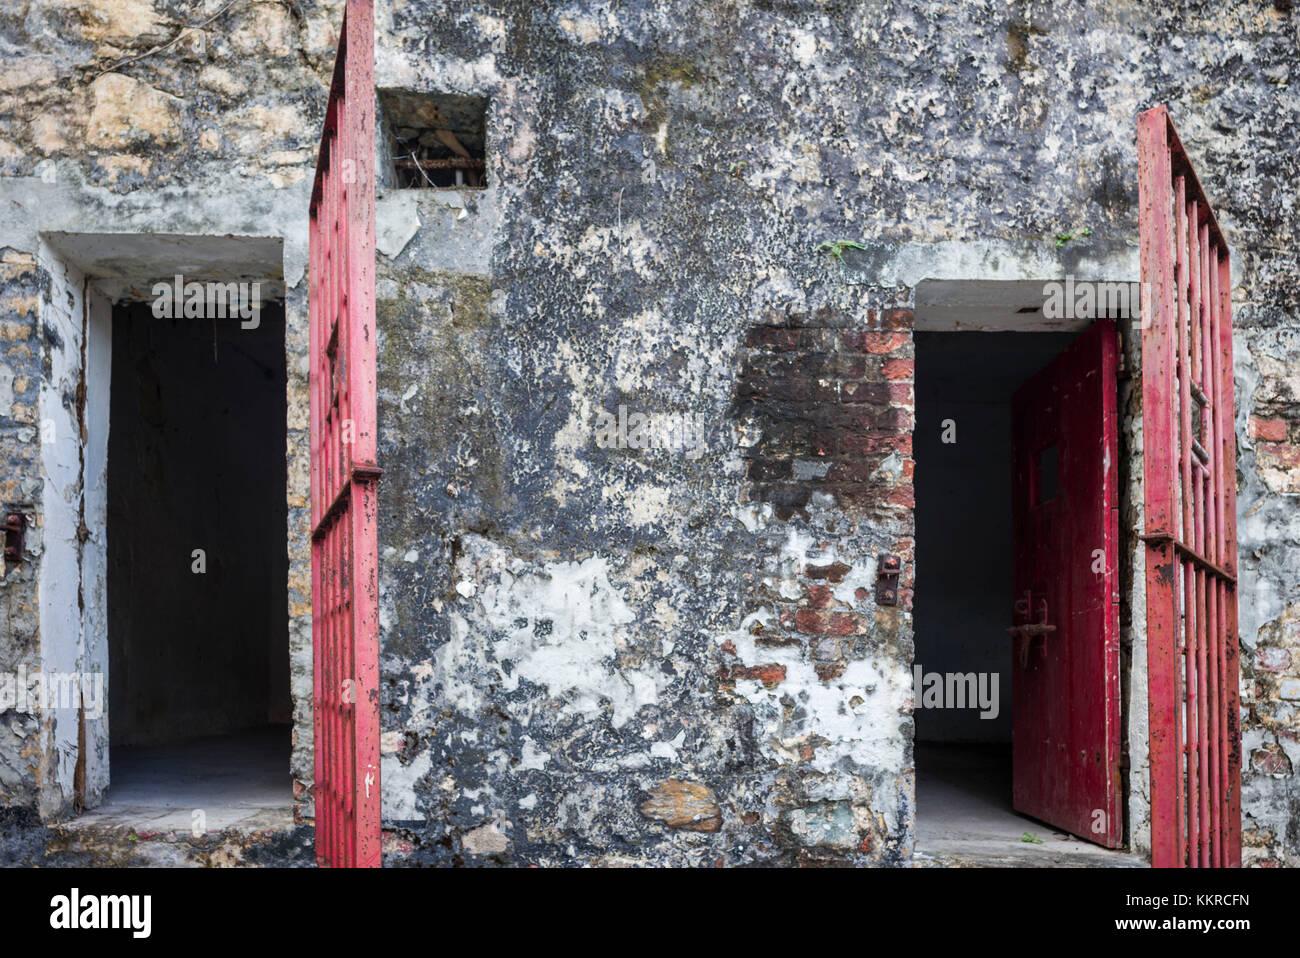 British Virgin Islands, Tortola, Road Town, HM Prison Museum, former prison, cellblock - Stock Image